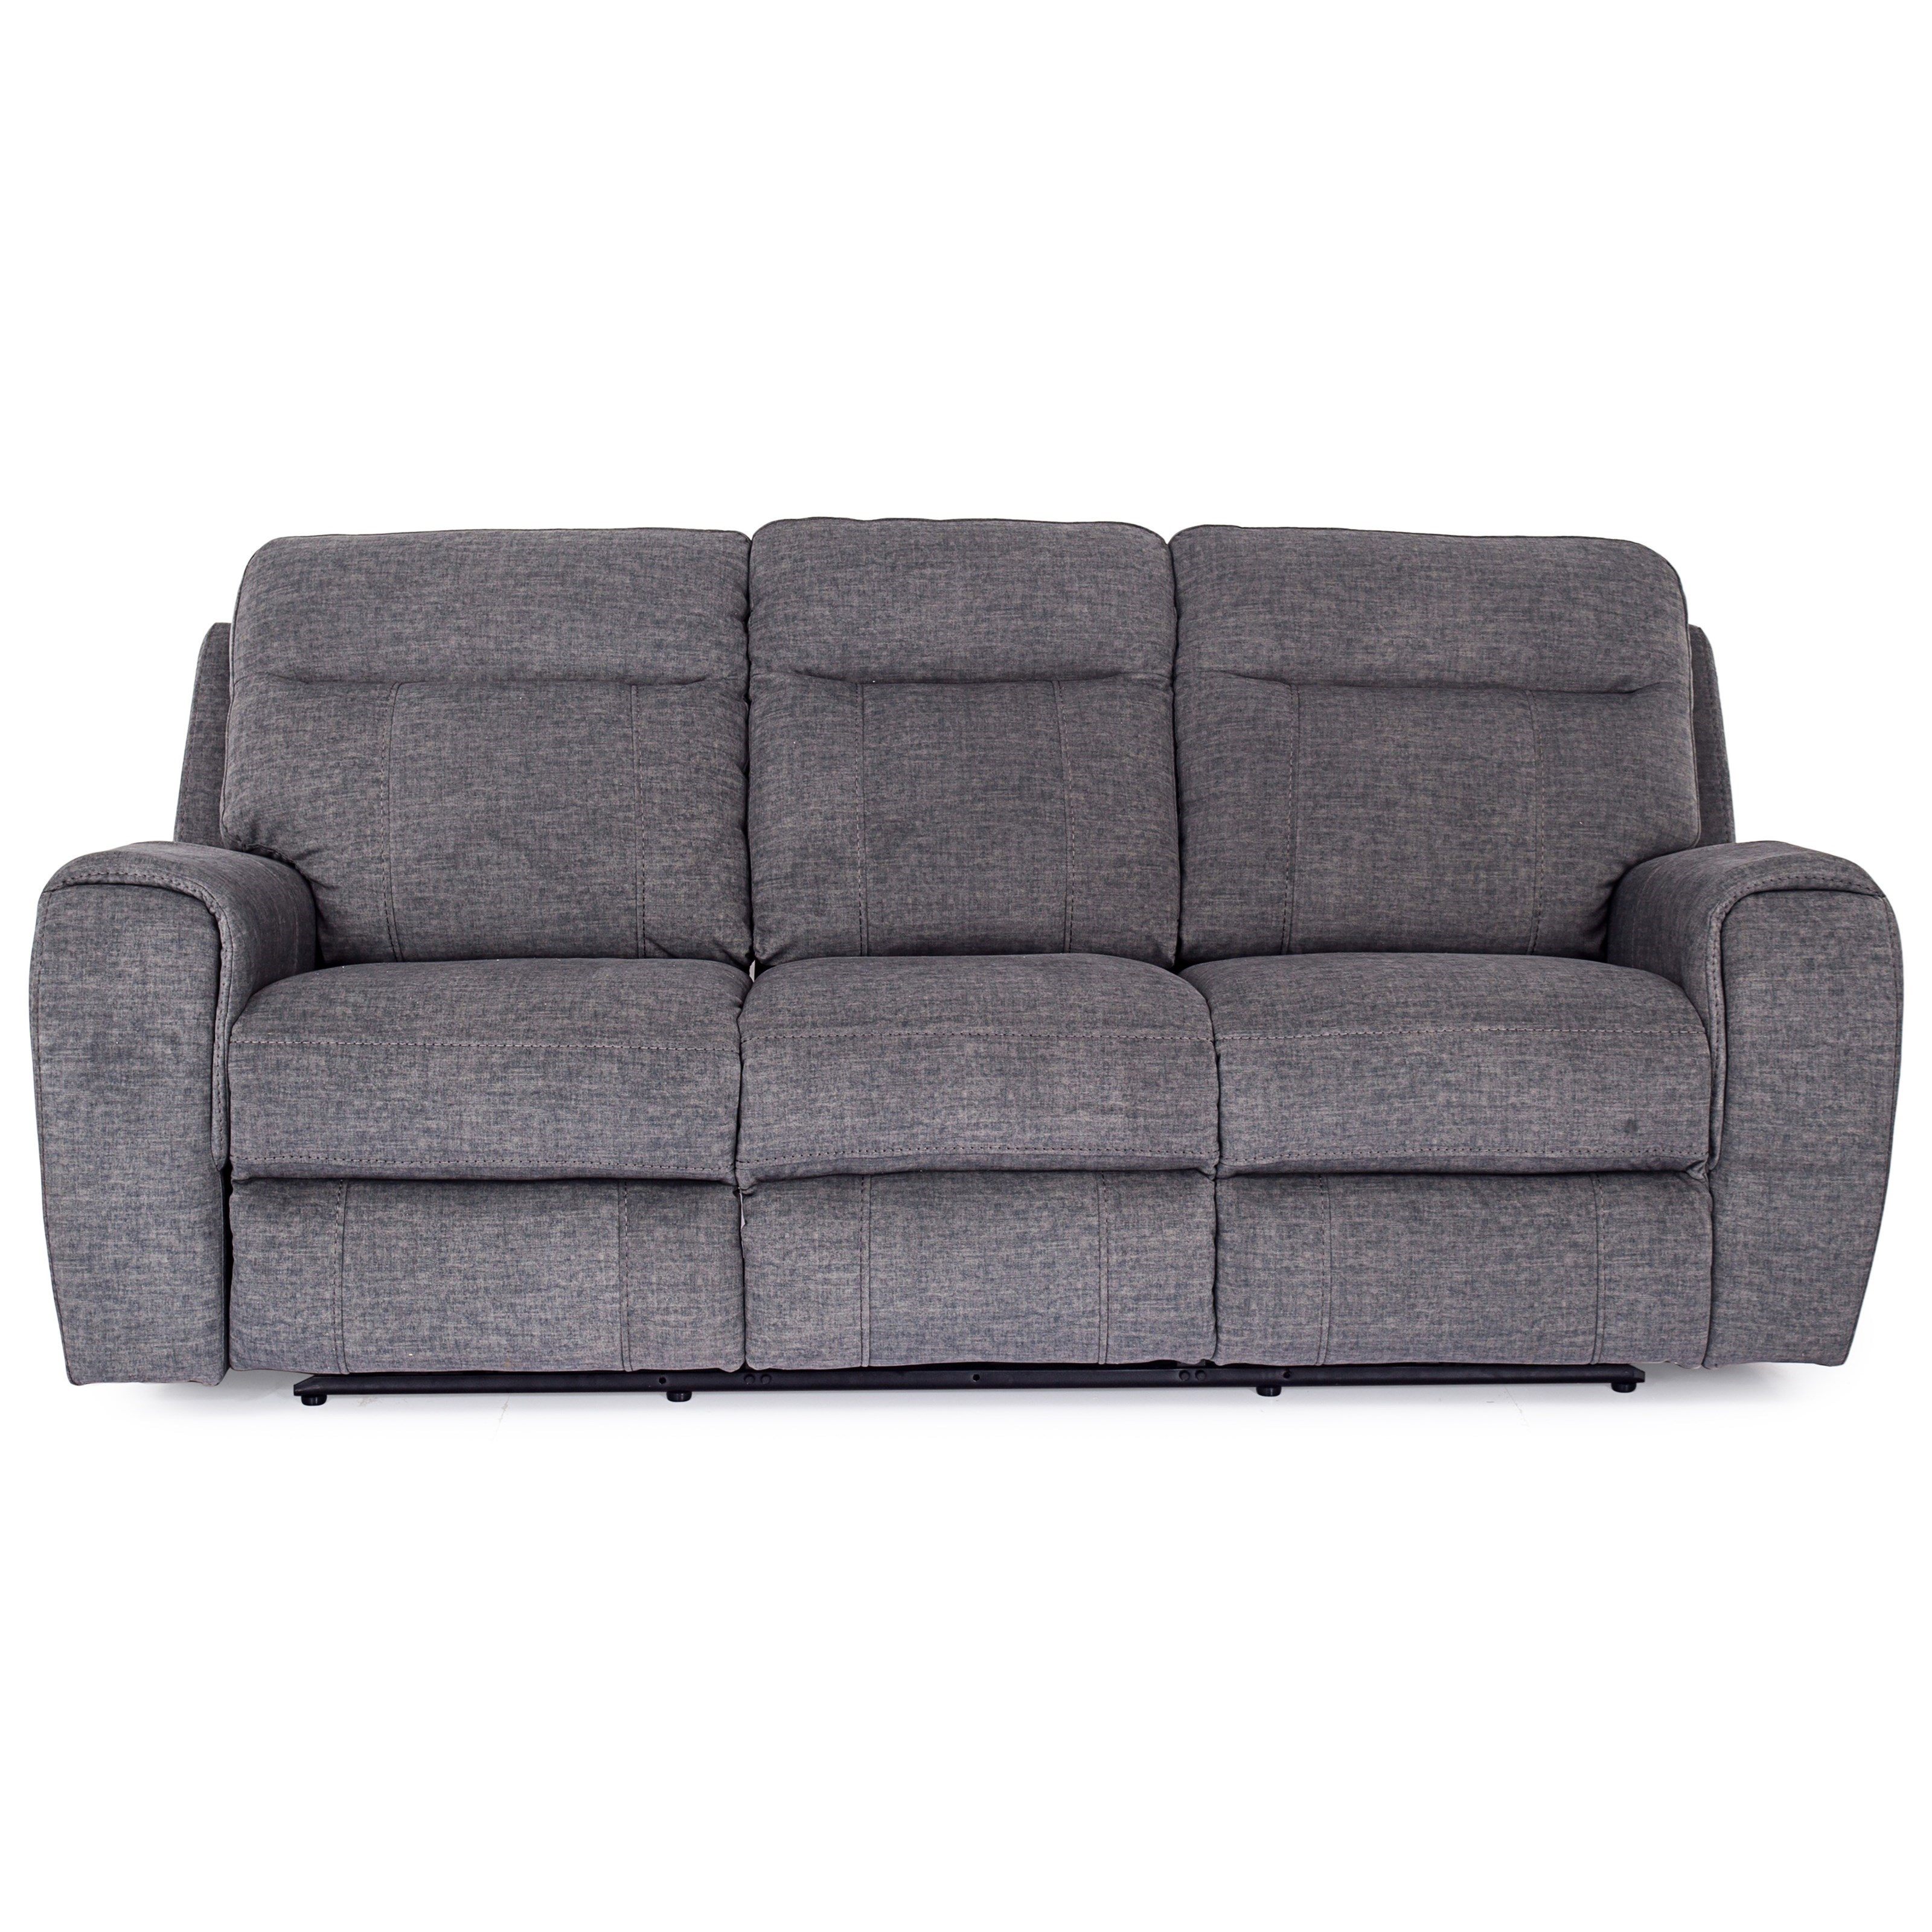 9868 Reclining Sofa w/ Power Headrests at Pilgrim Furniture City